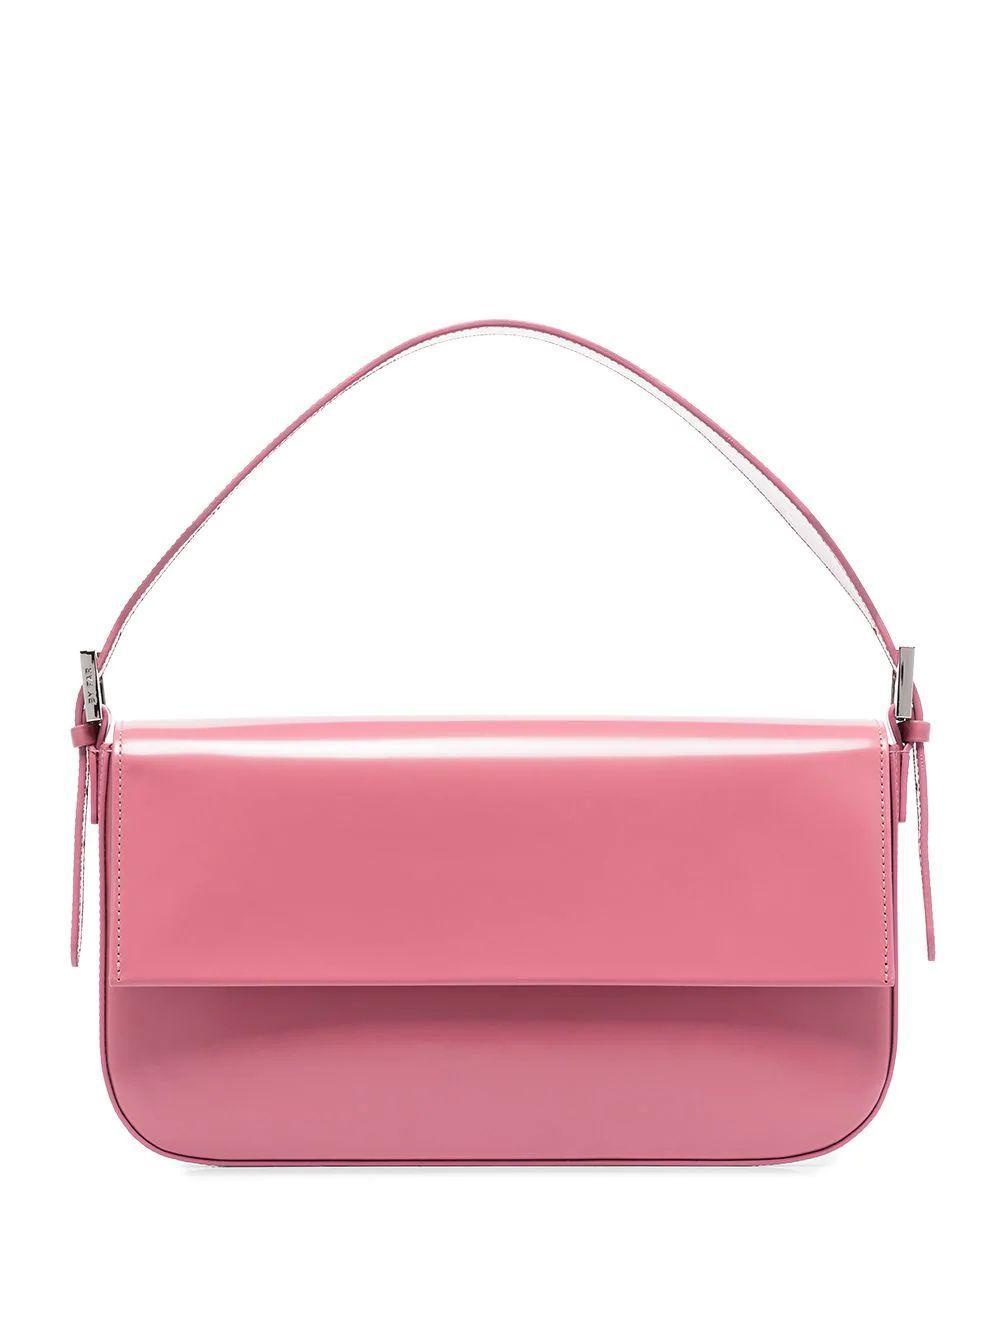 Manu Semi-Patent Shoulder Bag